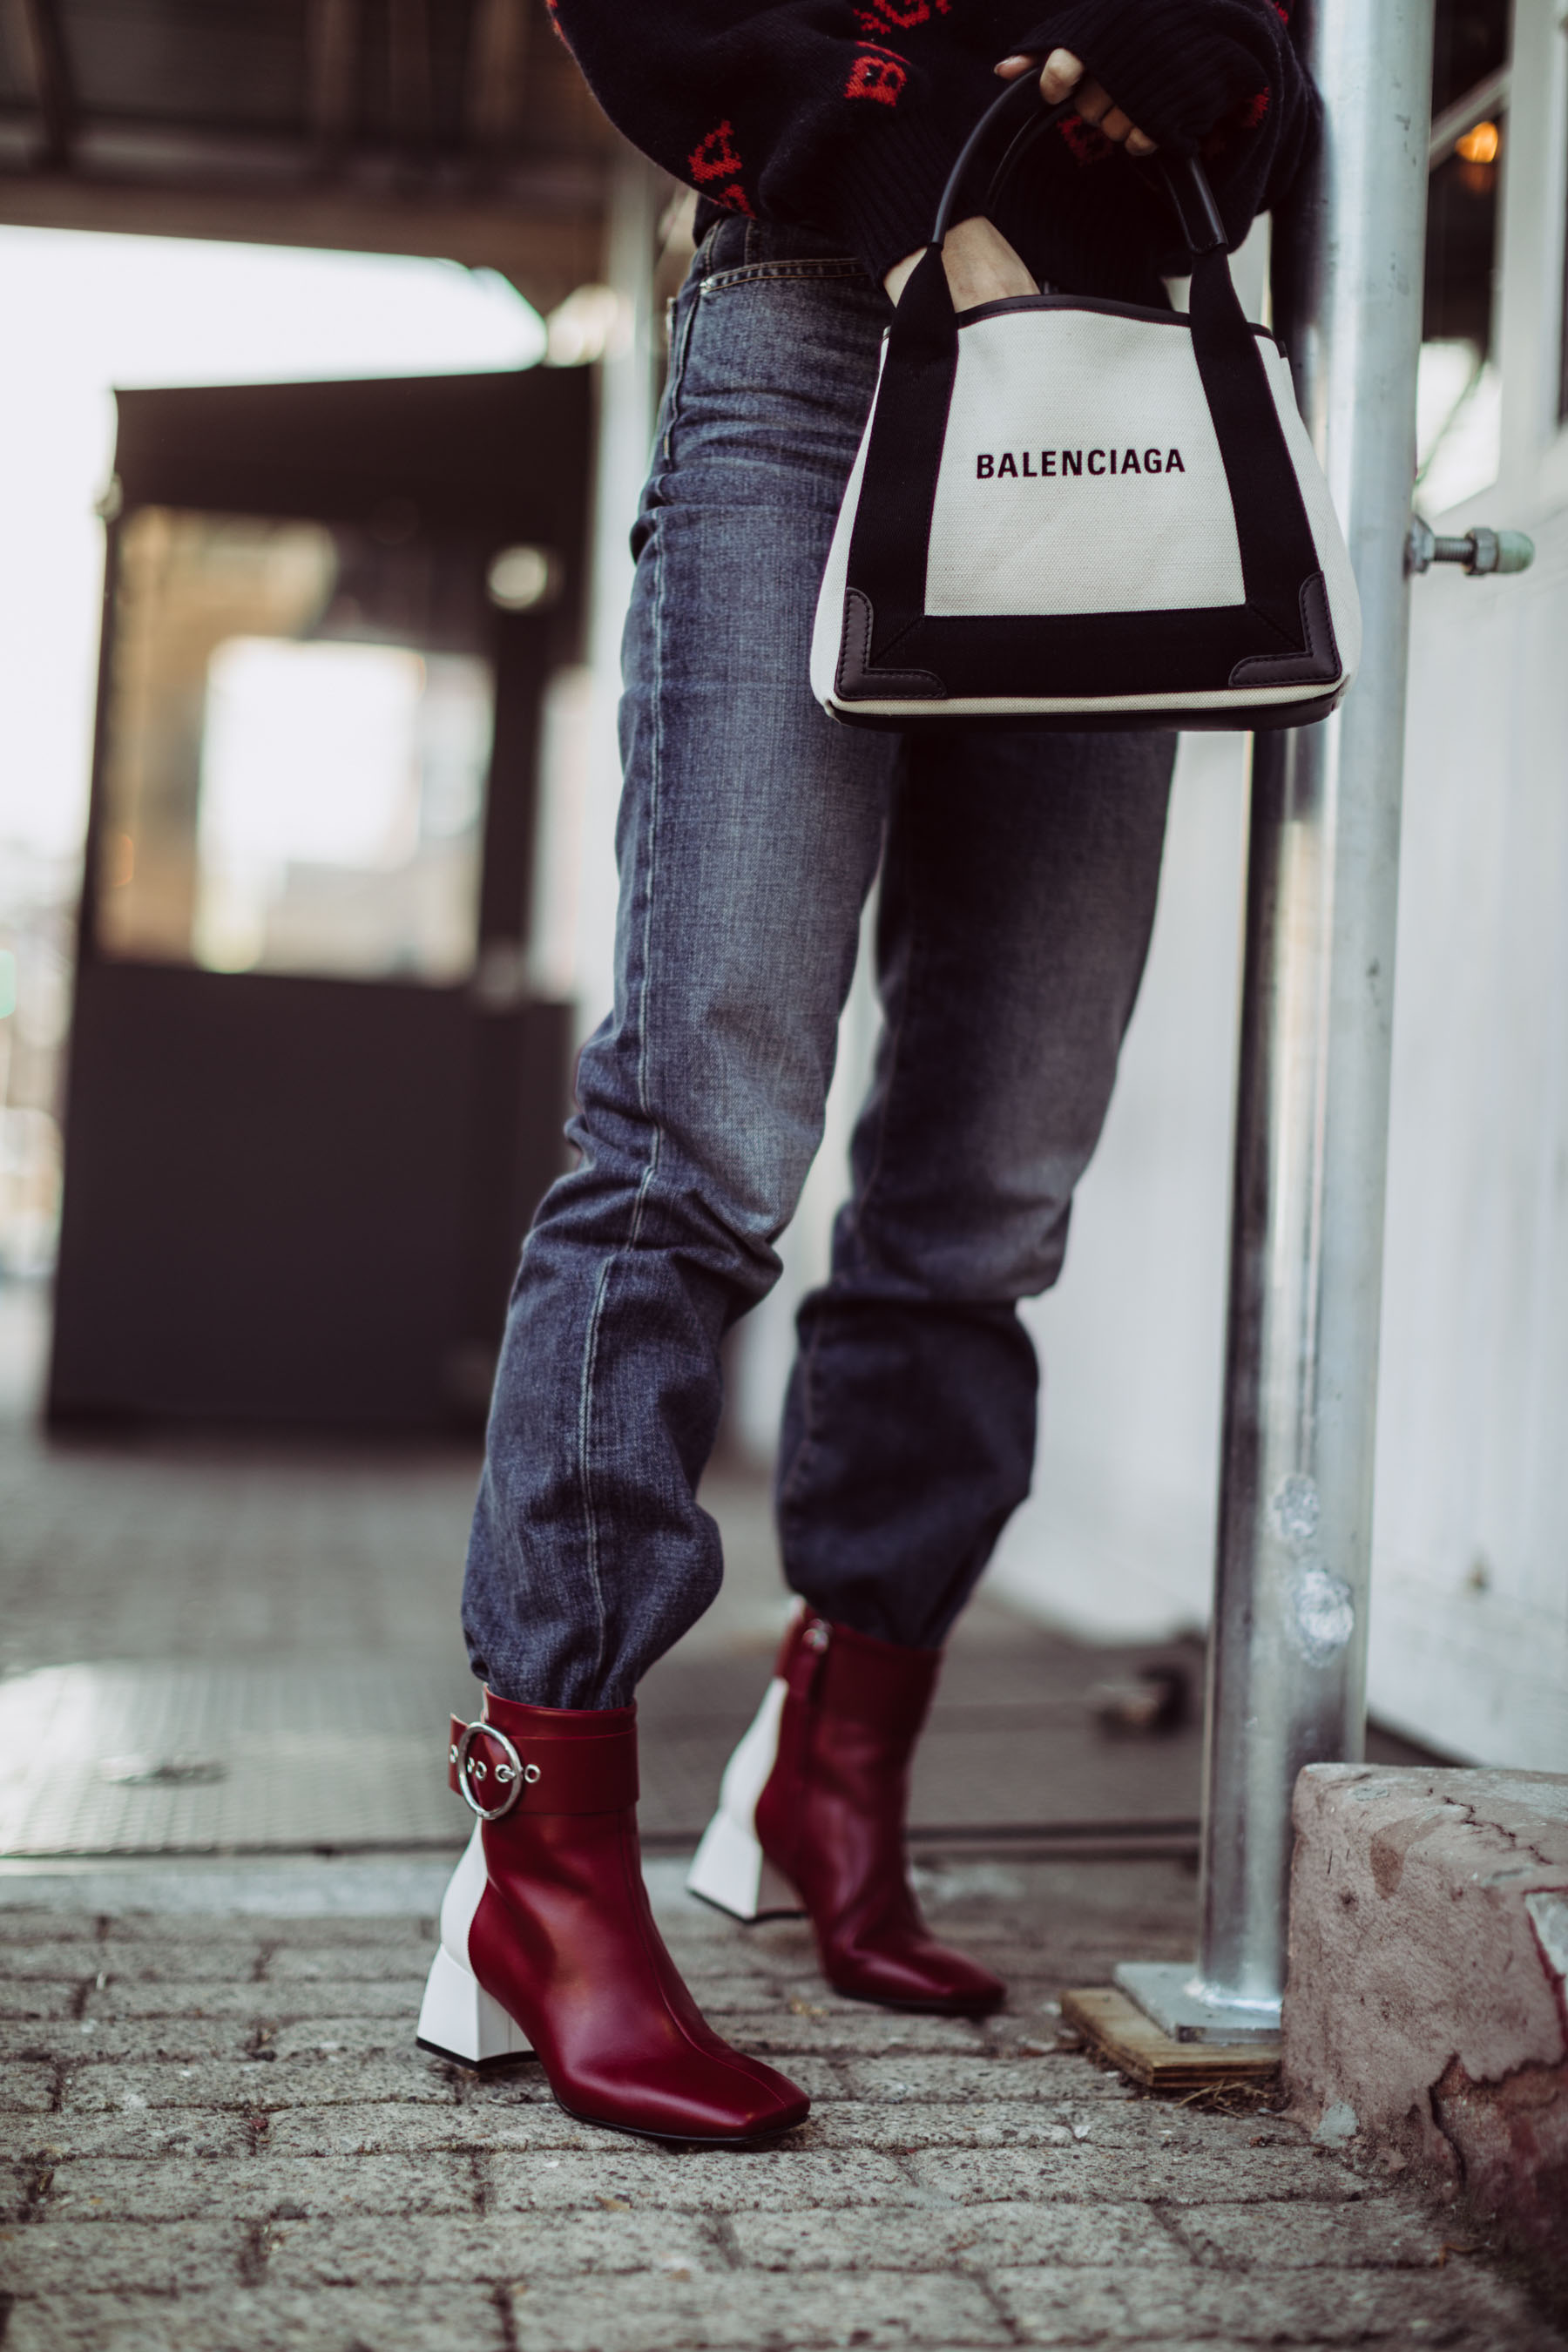 best fall 2019 boots, square toe boots, Balenciaga Logo Sweater, Balenciaga Tote, Dakar Boots, NYC Street Style // Notjessfashion.com